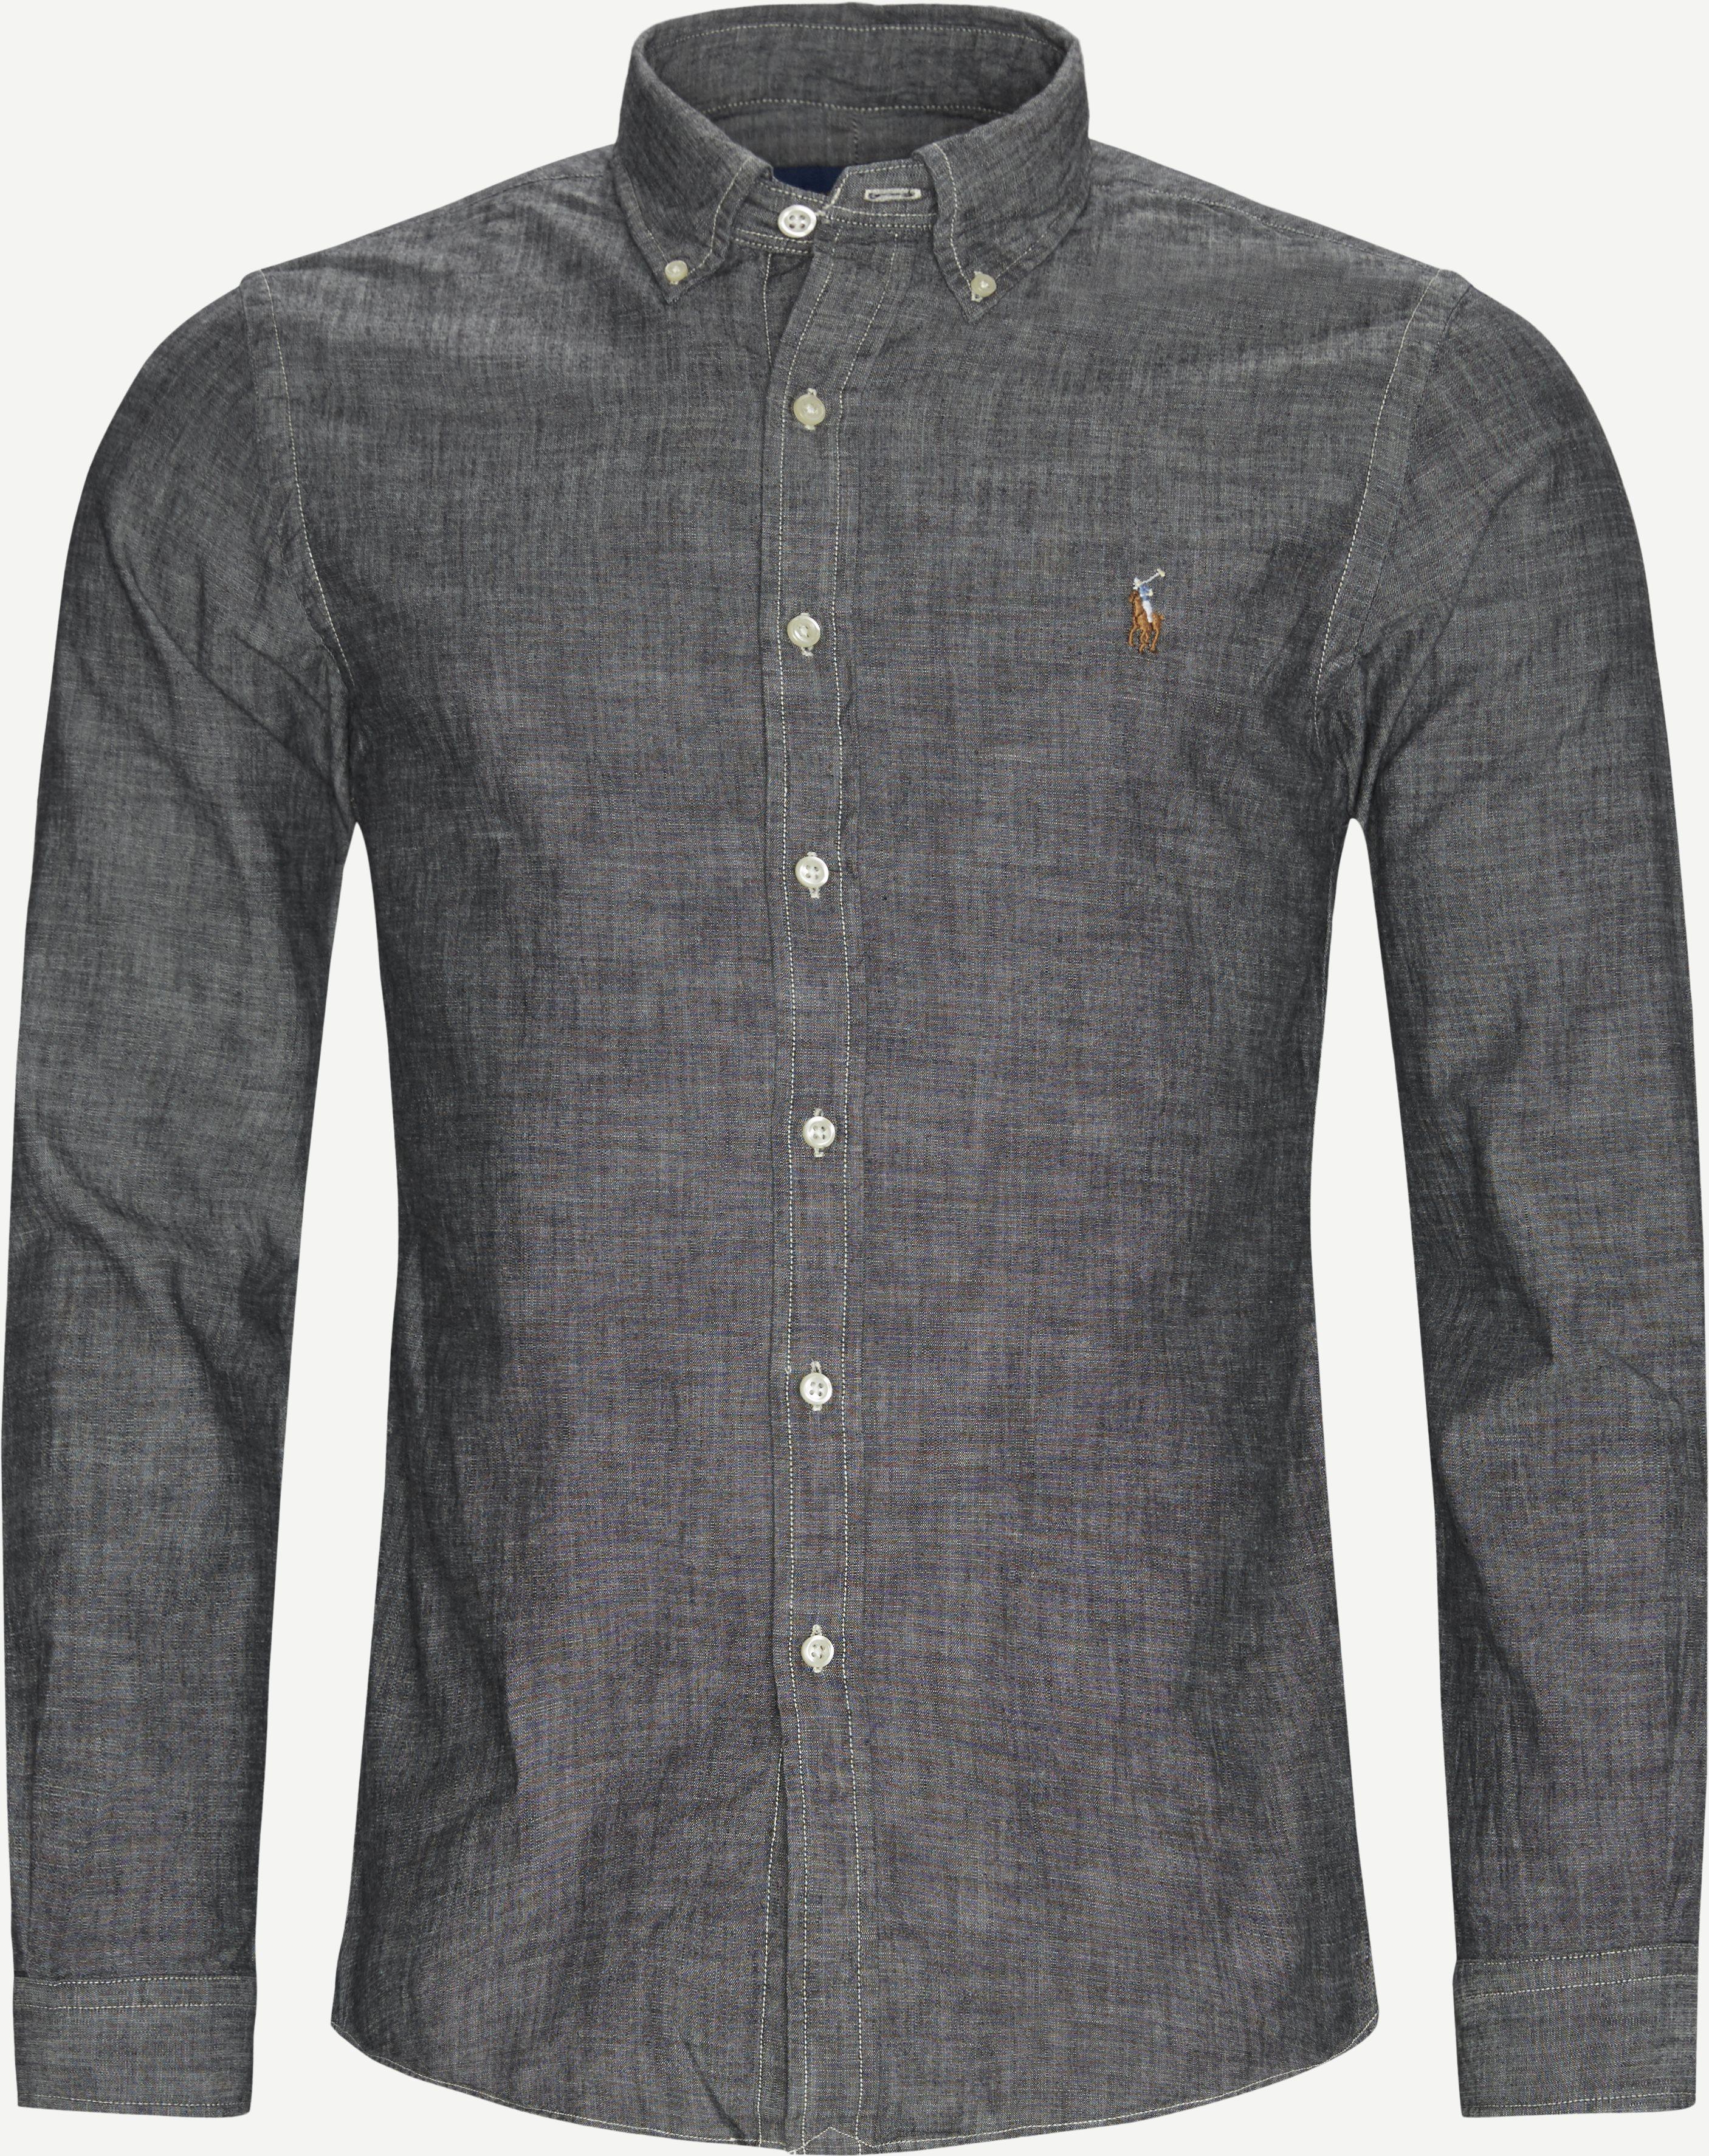 Shirts - Slim - Grey